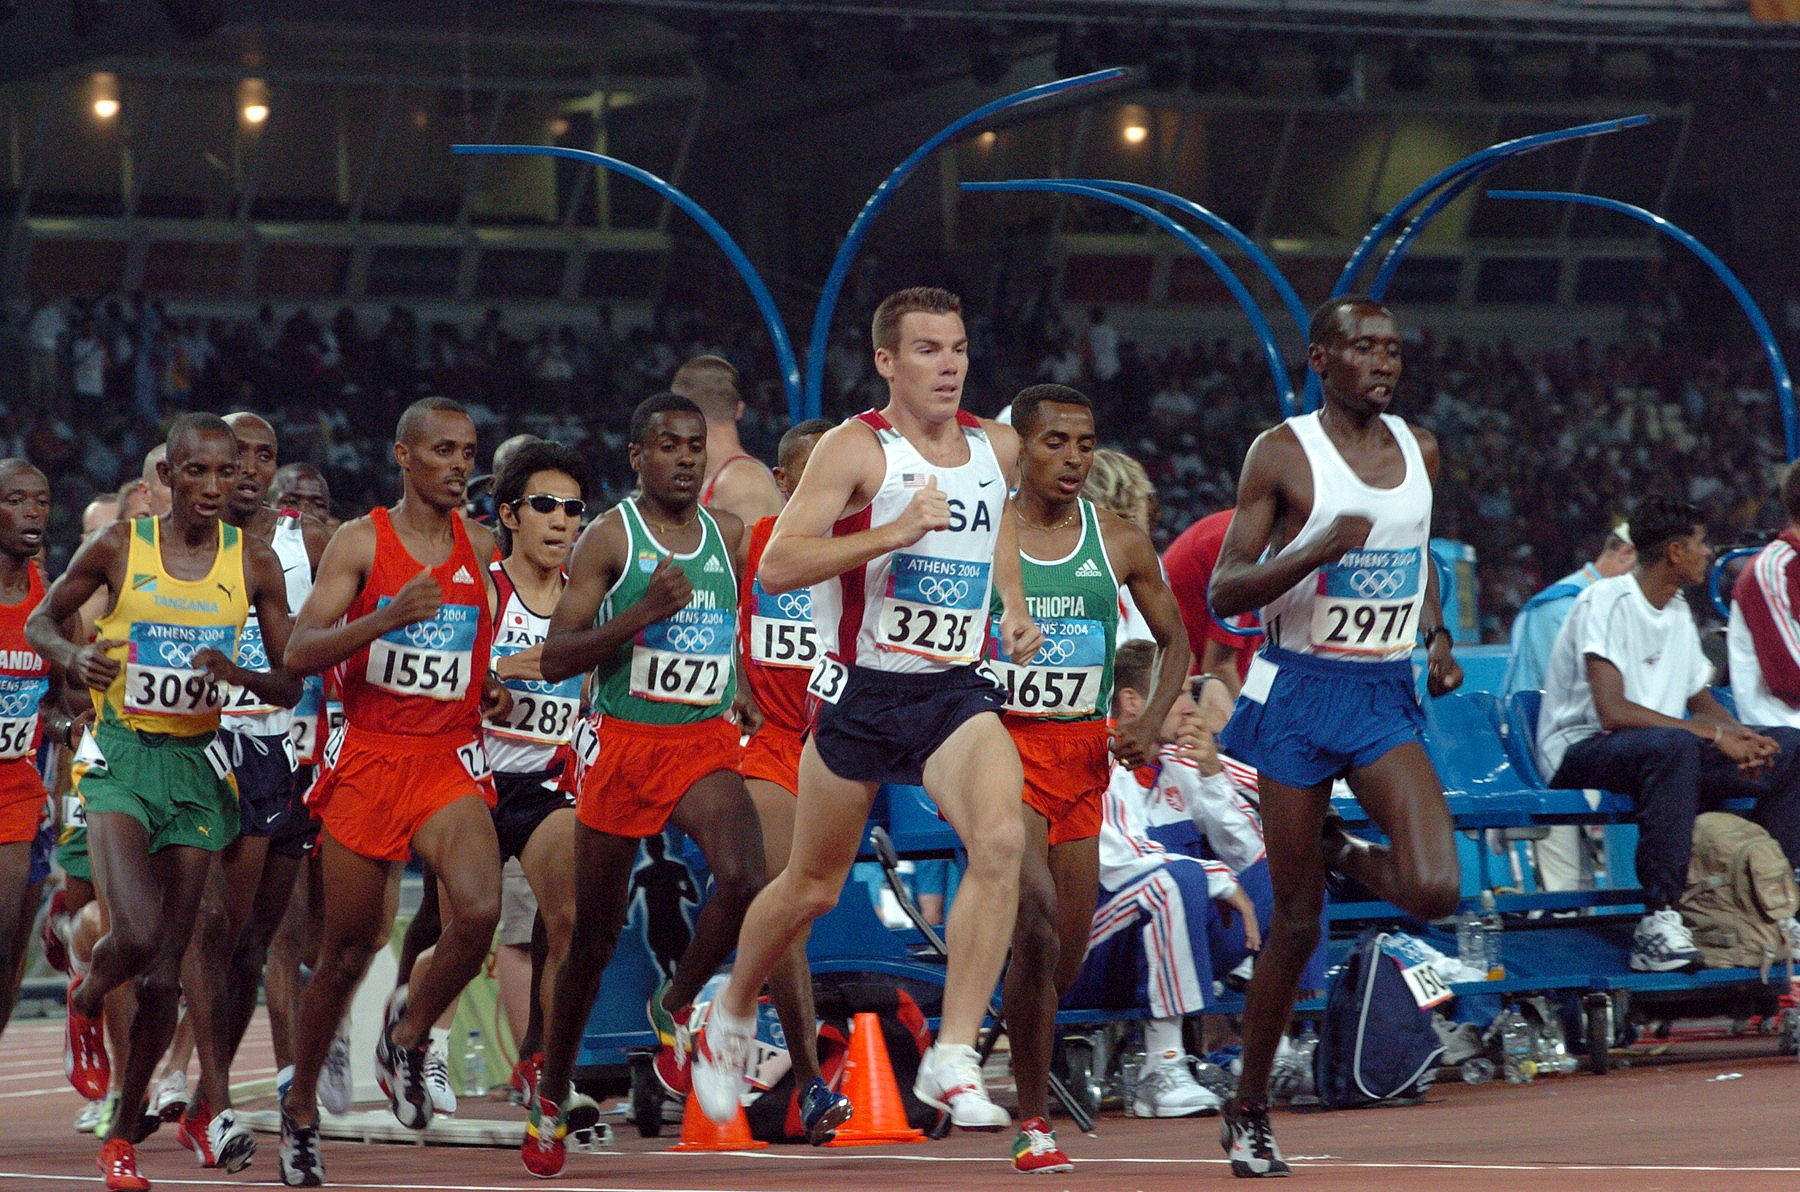 marathon prep like training for war says olympian article the